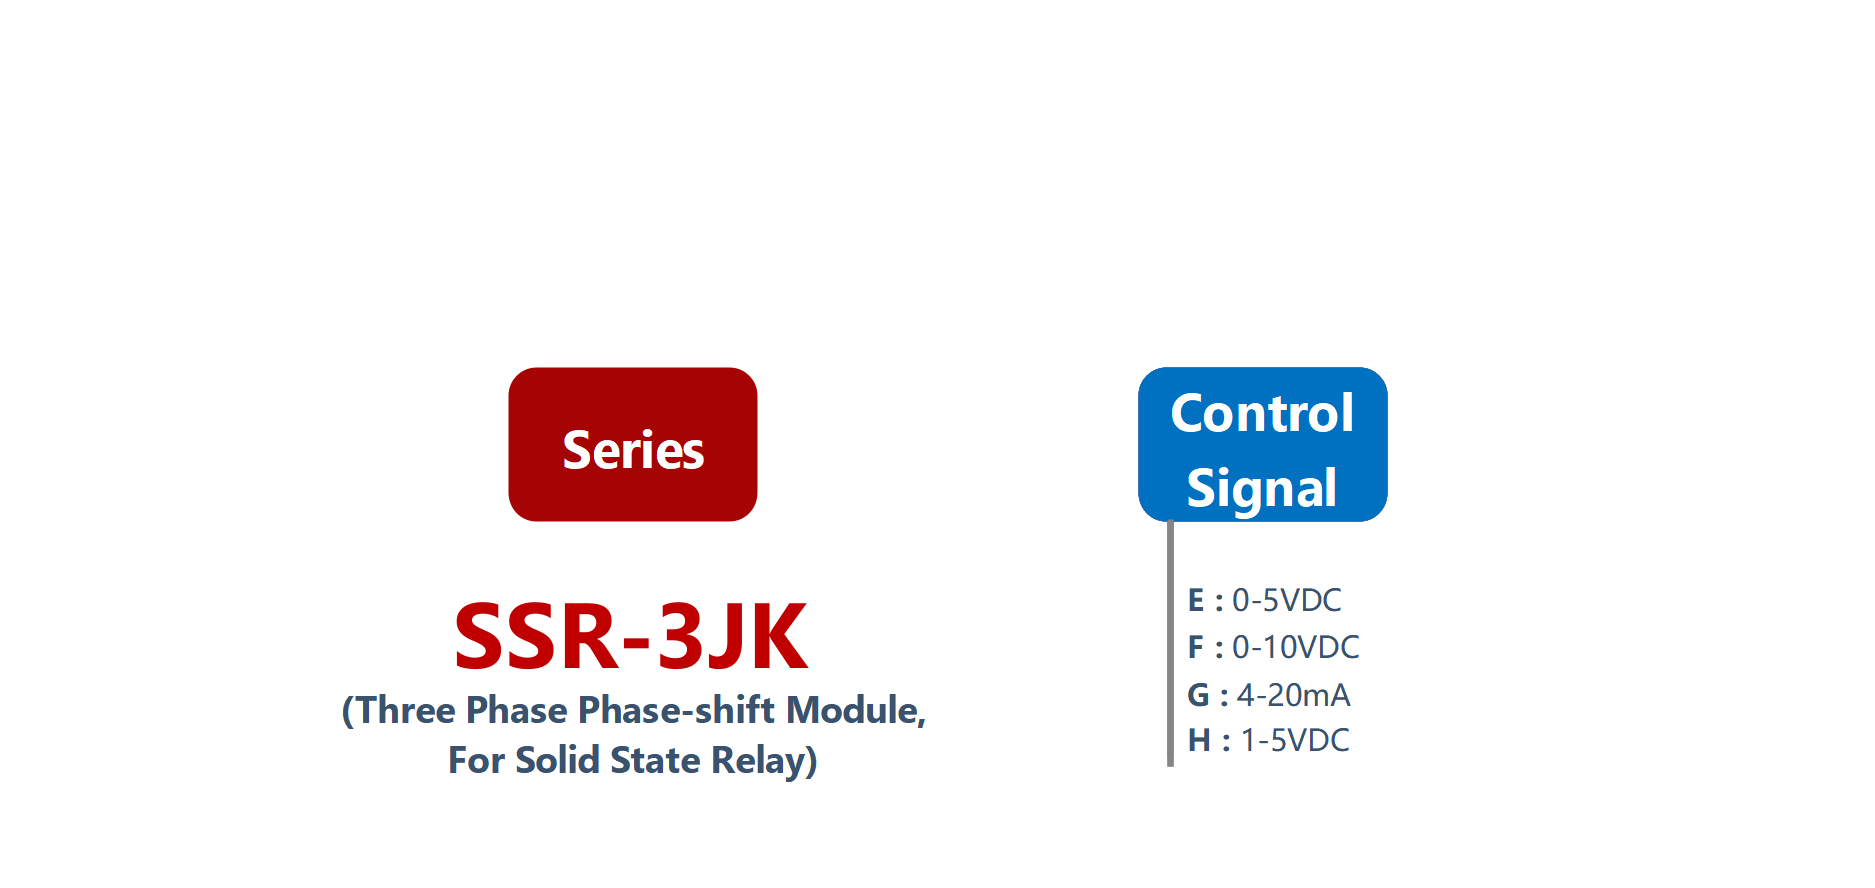 How to order SSR-3JK Series Voltage Power Regulator